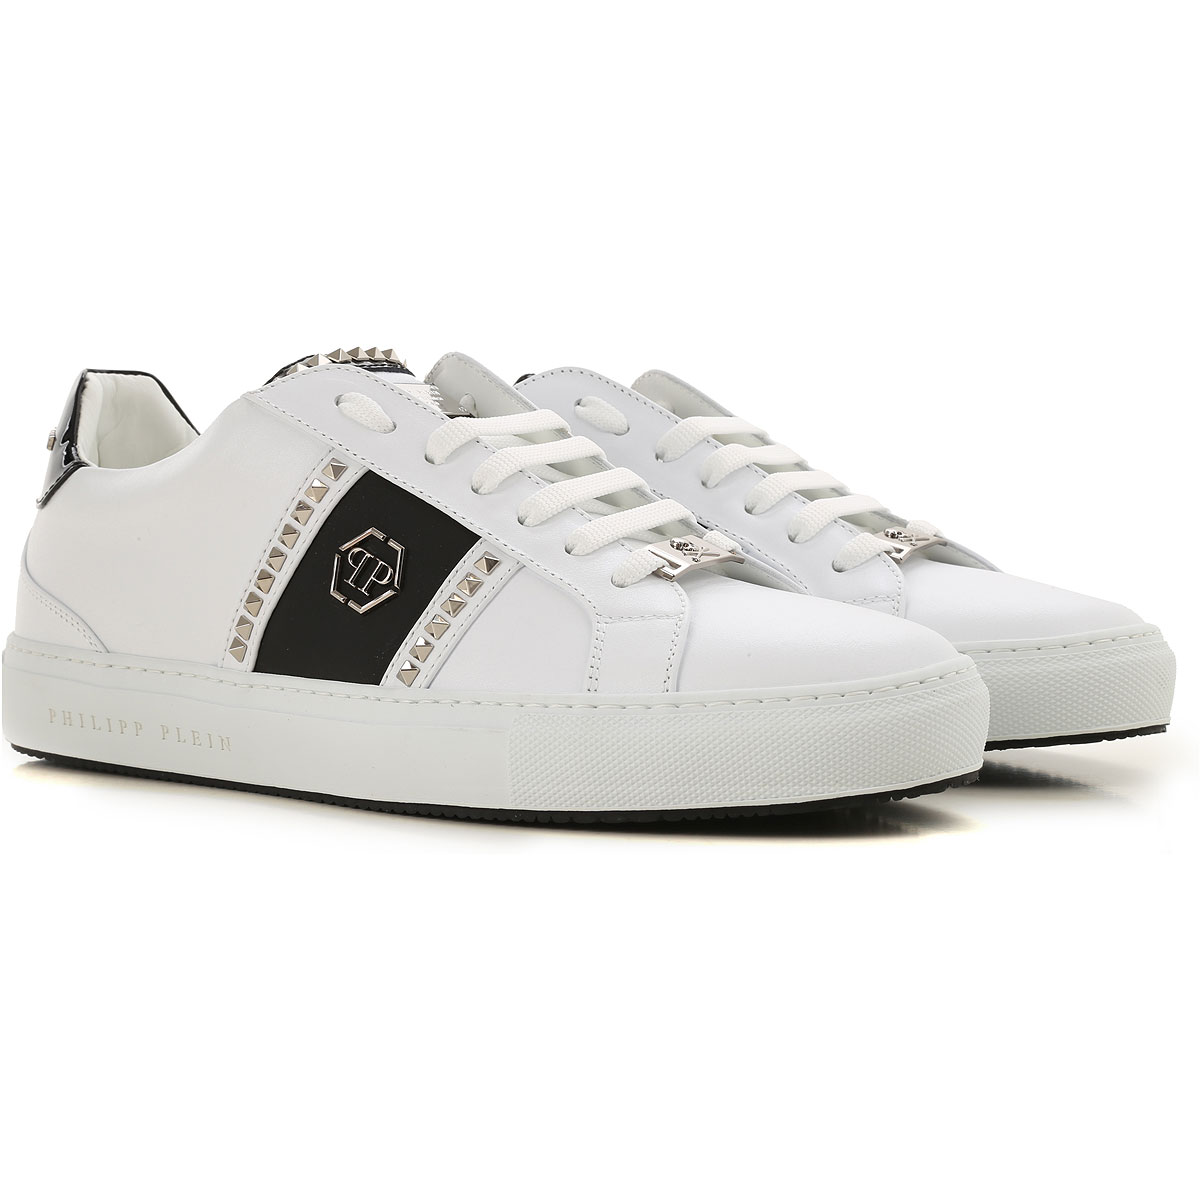 Louisa Beige P19 Plates P19 Chaussures Beige Plates Chaussures Louisa rBdxoCe